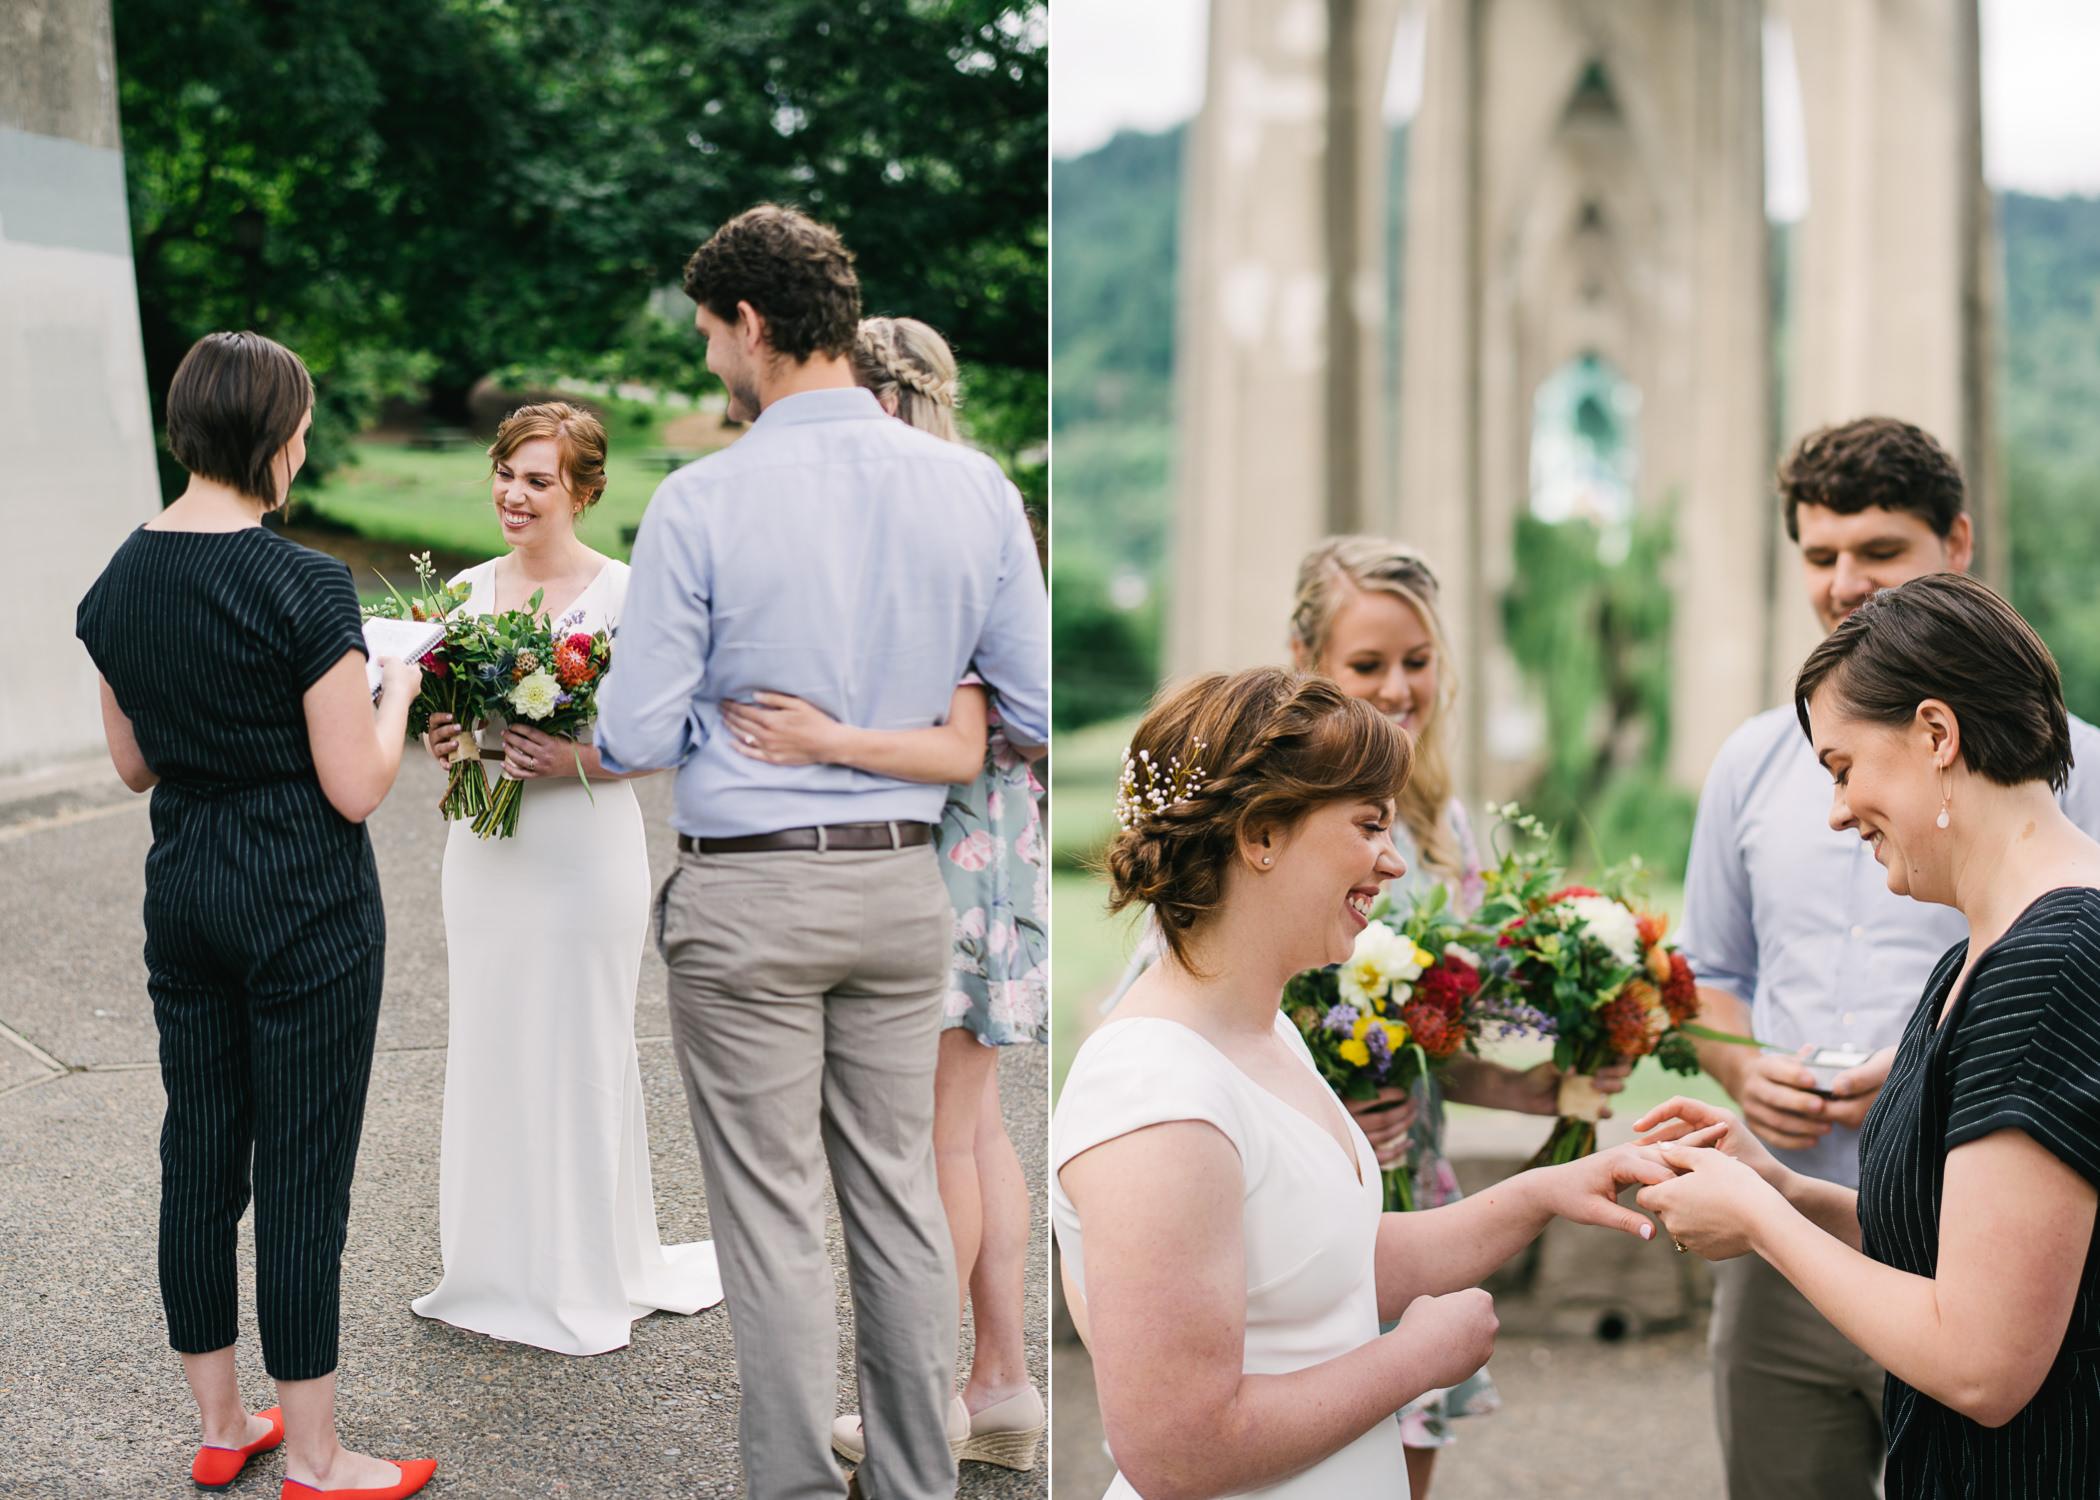 cathedral-park-portland-elopement-gay-wedding-029.JPG